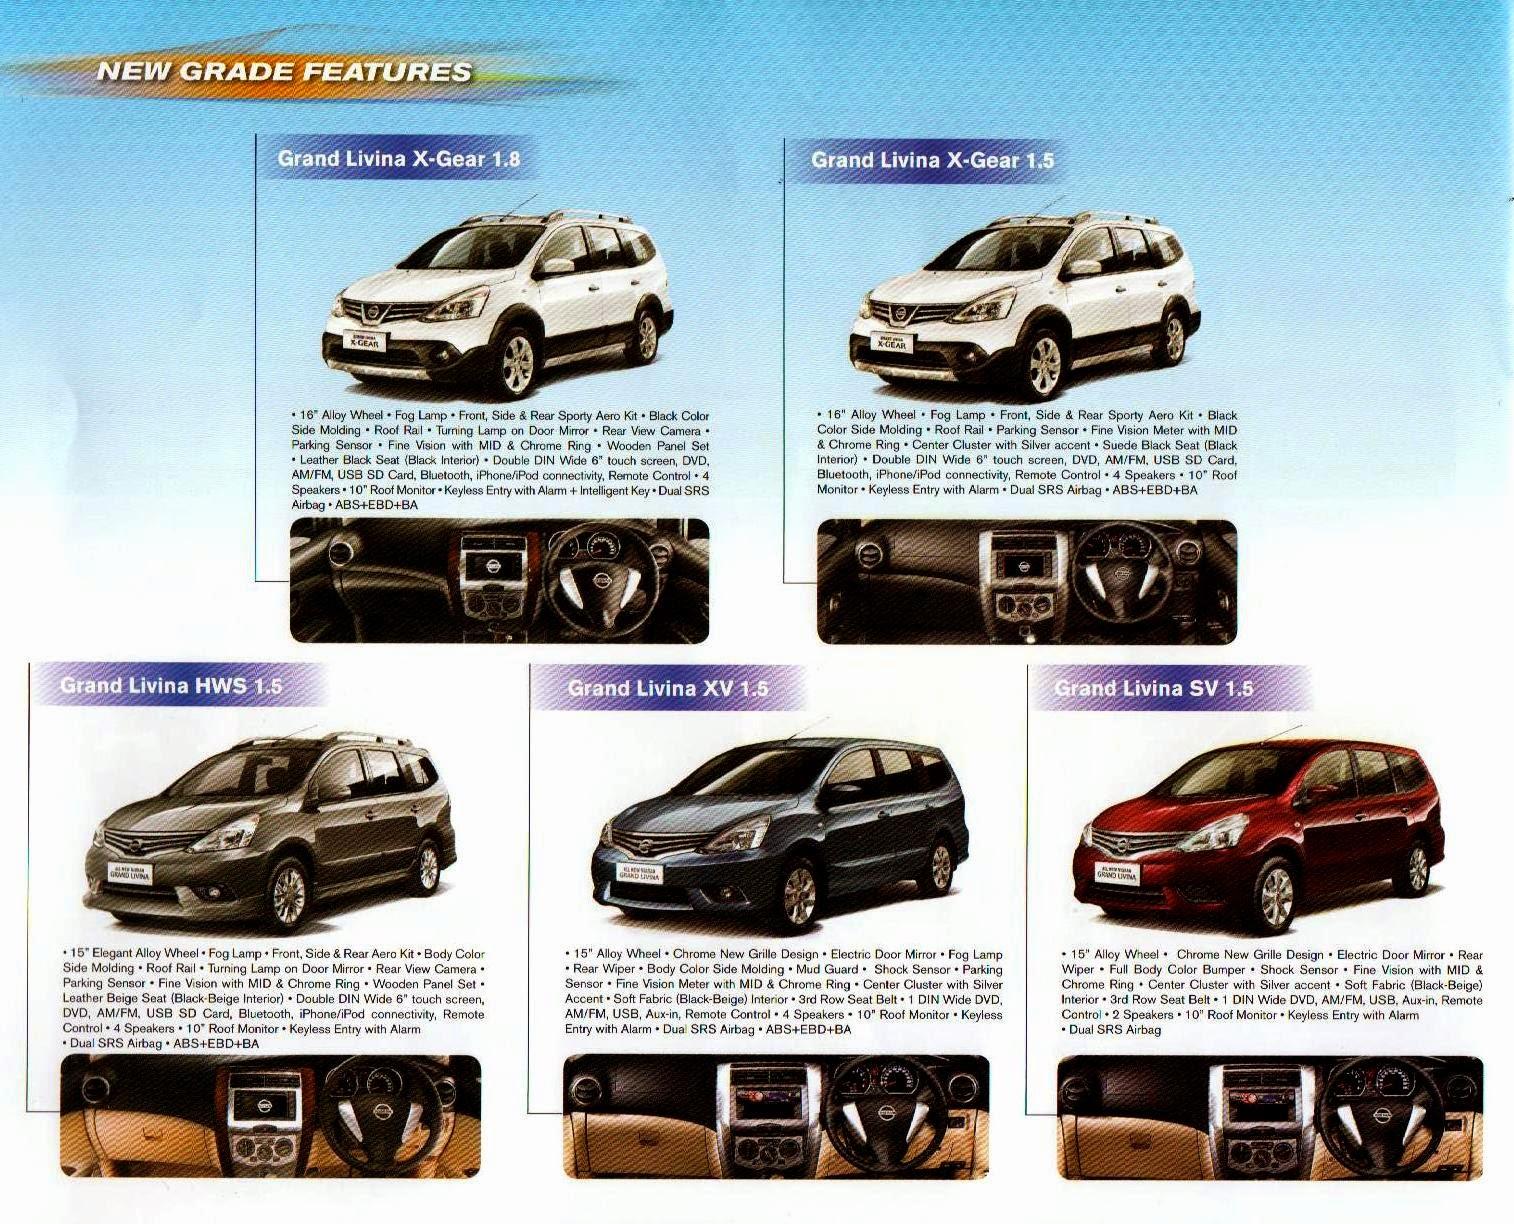 Harga Nissan Grand Livina Naik